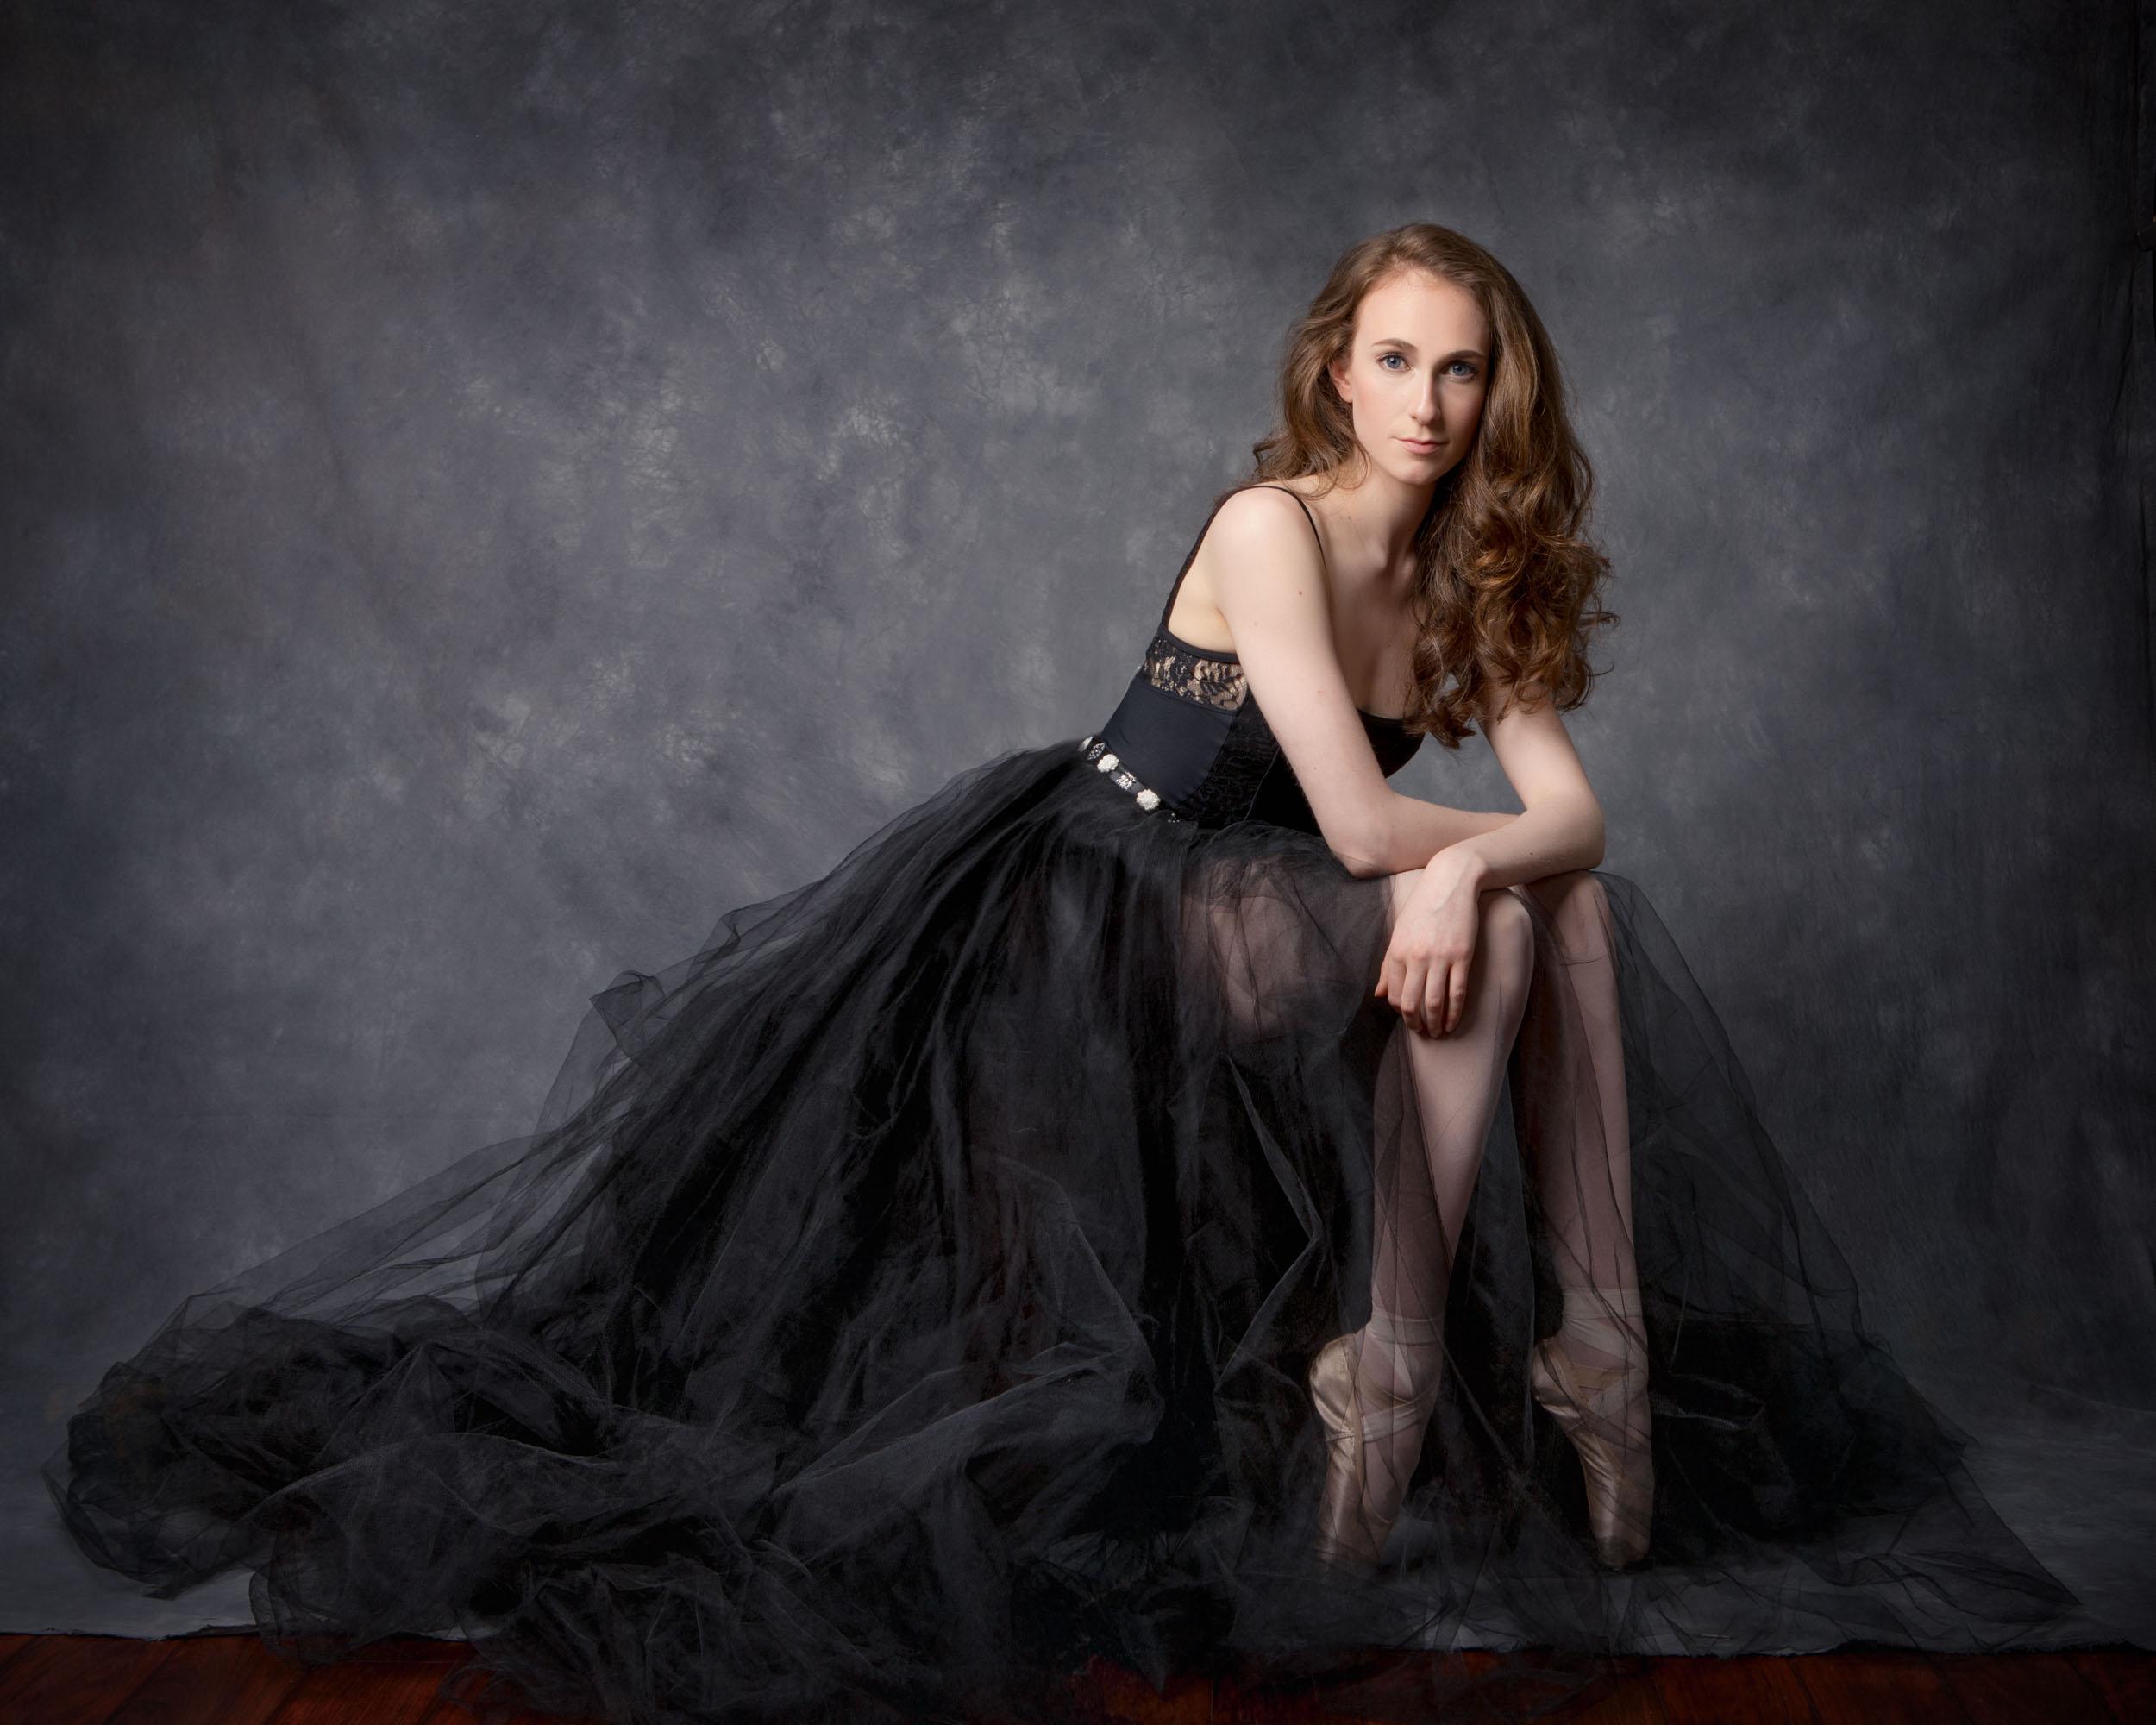 Ballerina_Portrait_Beautiful_Pooja Photography_ClickMyPix